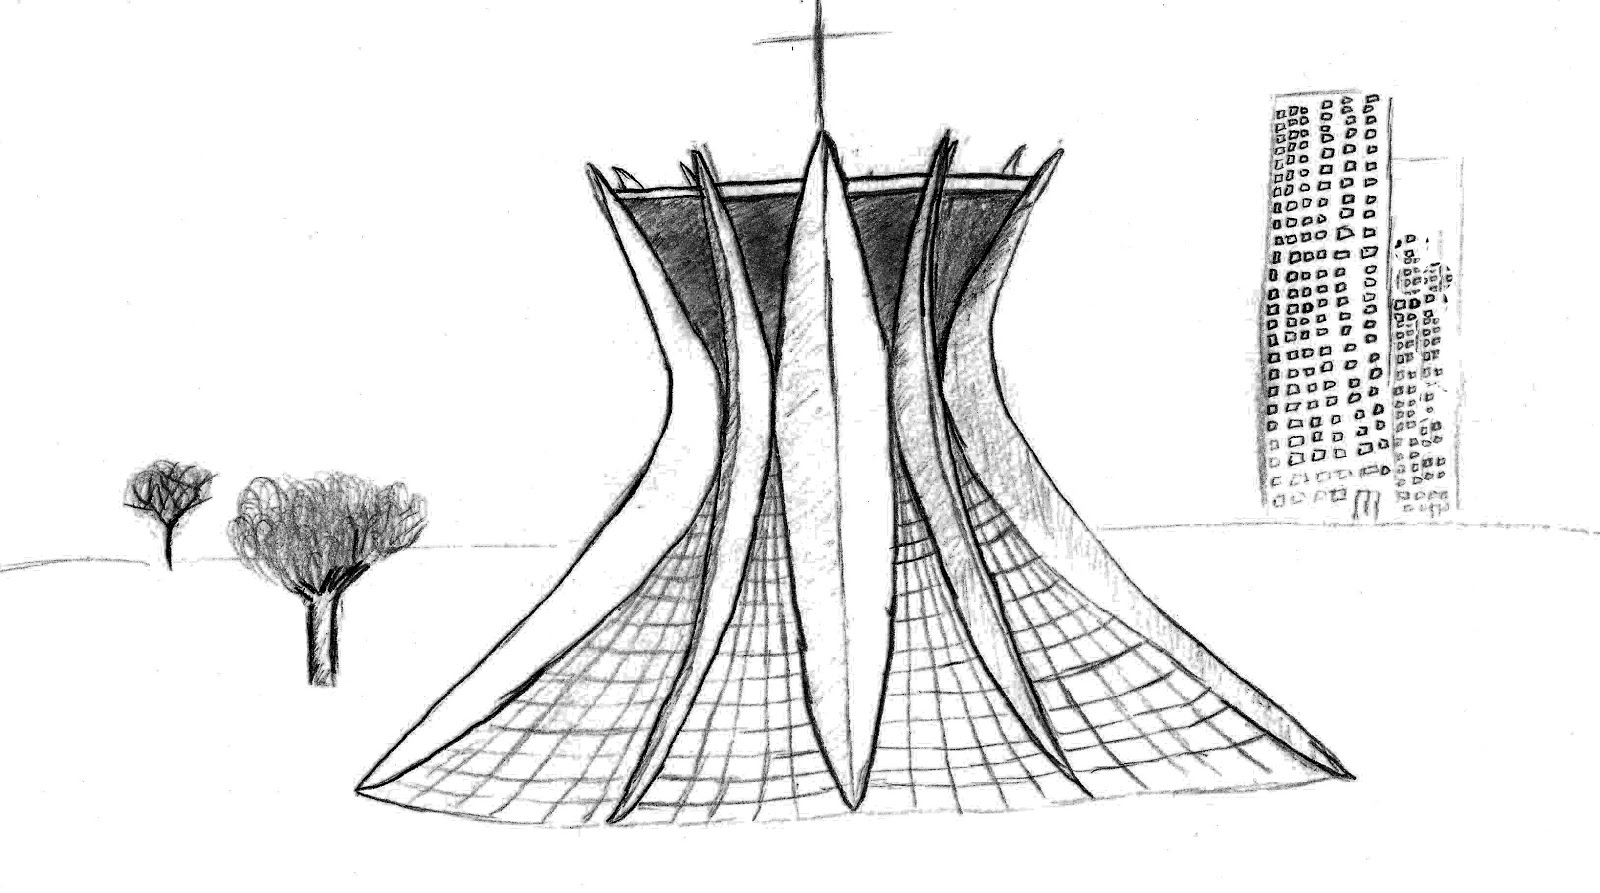 Architecture for Oscar plans